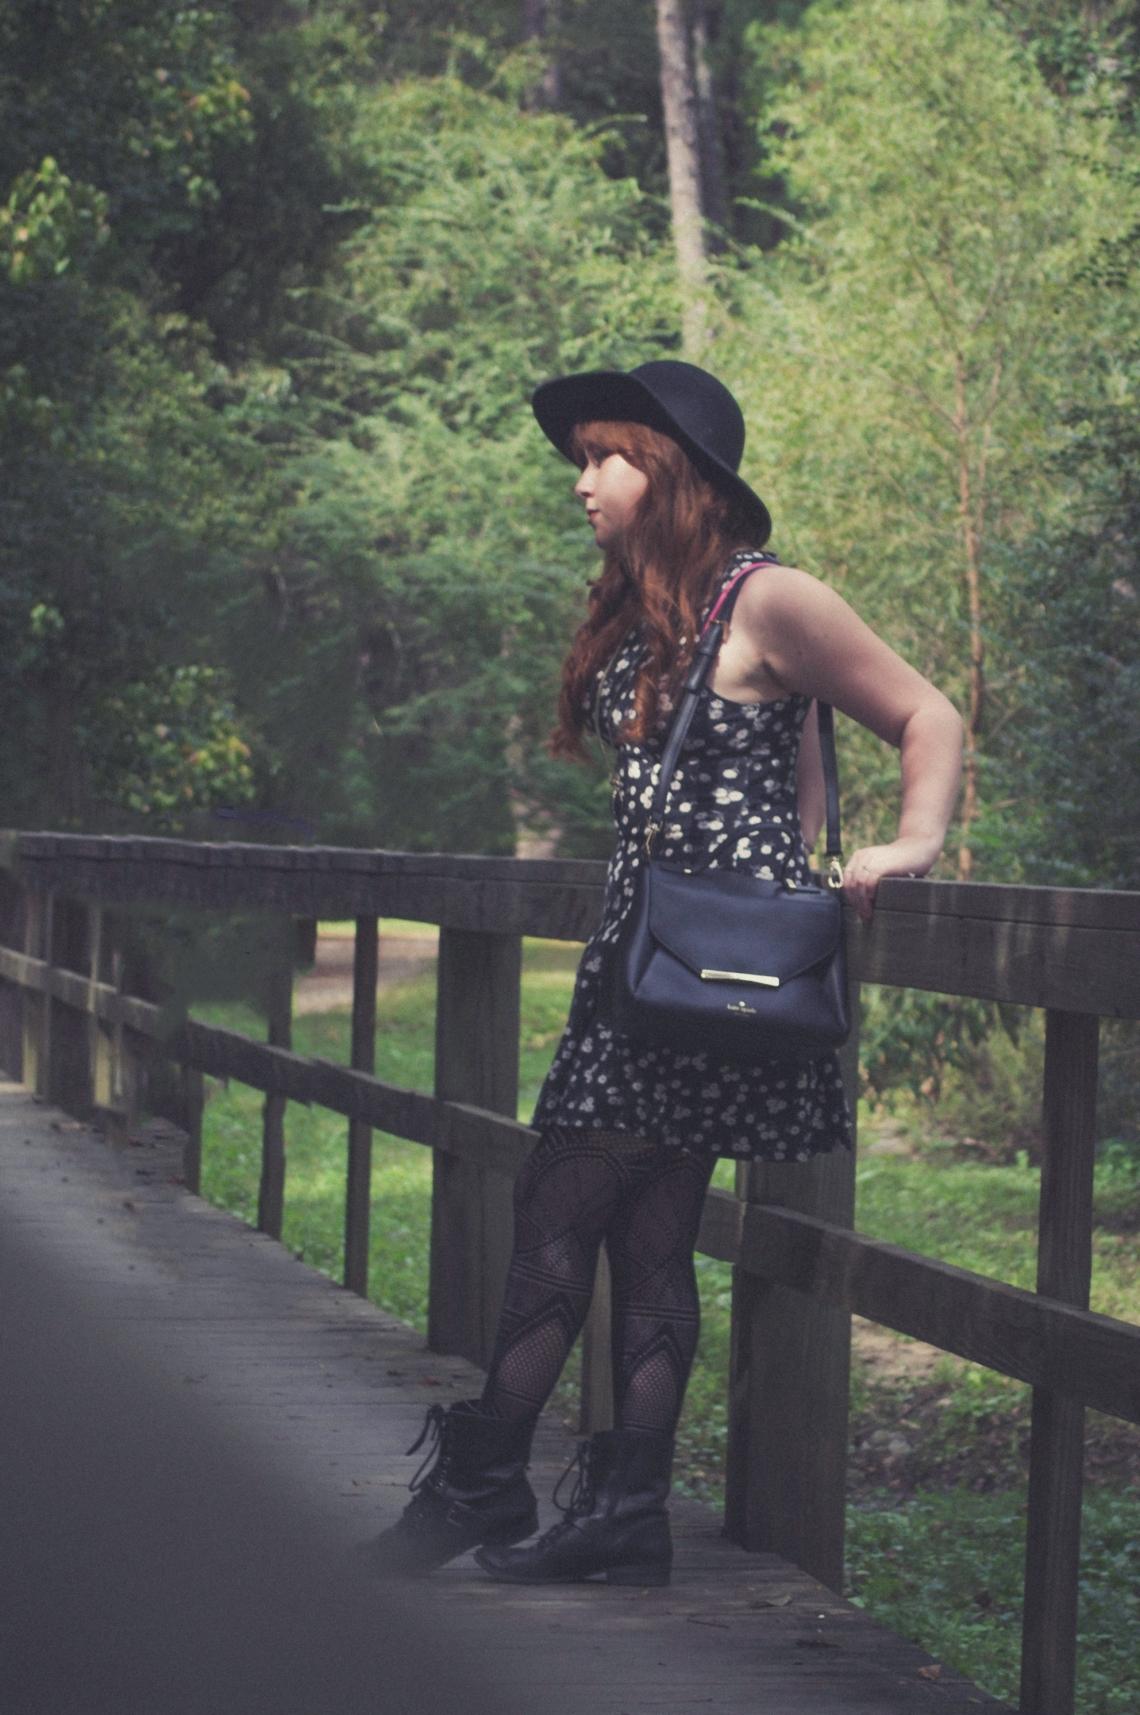 _giftofgabbyblog_2017-10-21_style_twitchy-witchy-girl-5